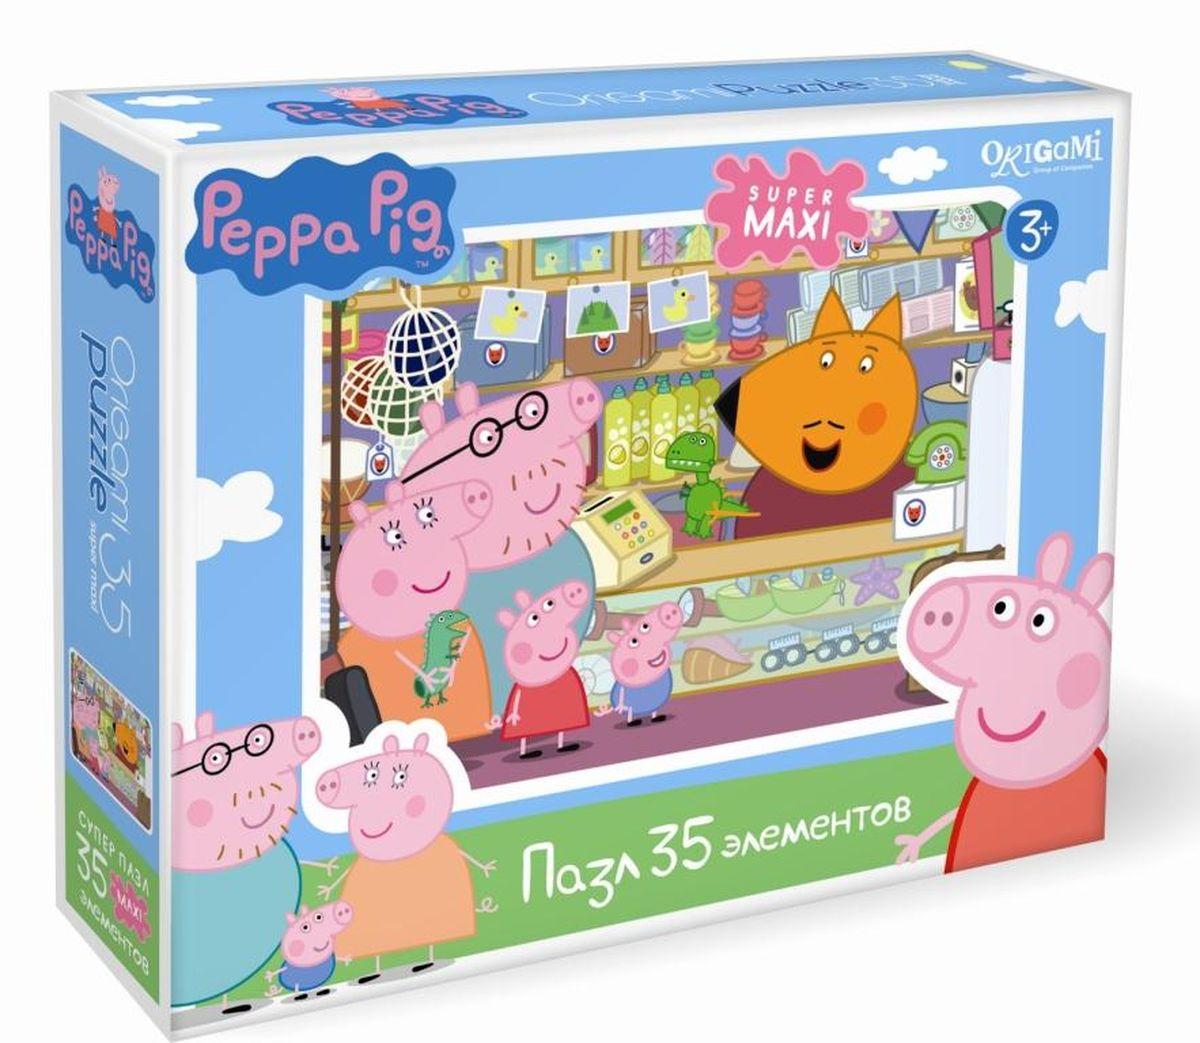 Оригами Пазл для малышей Peppa Pig Сувенирная лавка пазл origami 01569 peppa pig 24эл